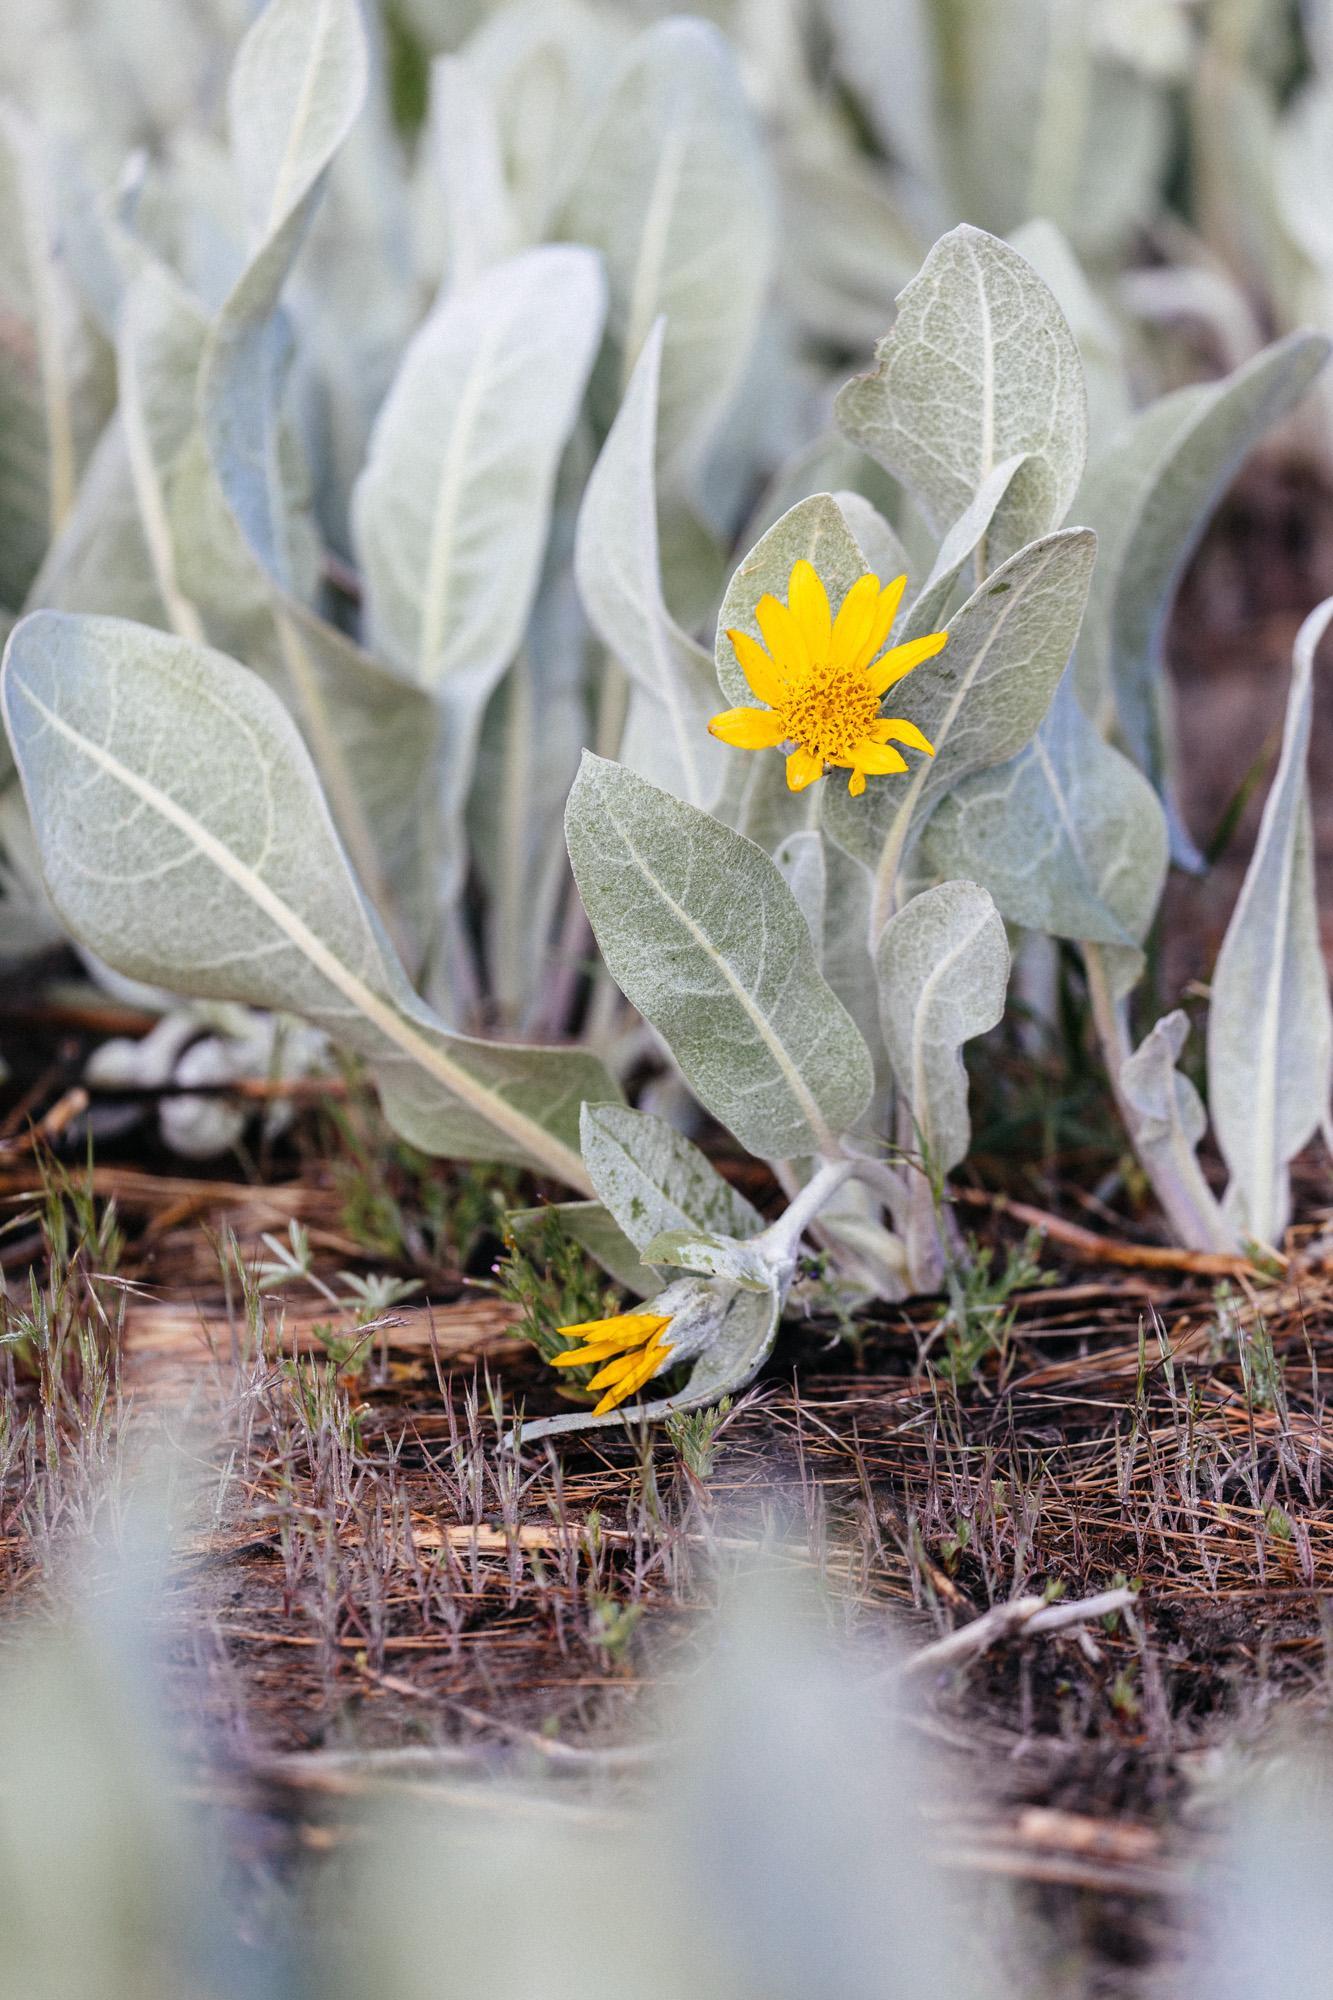 Wyethia mollis in bloom.